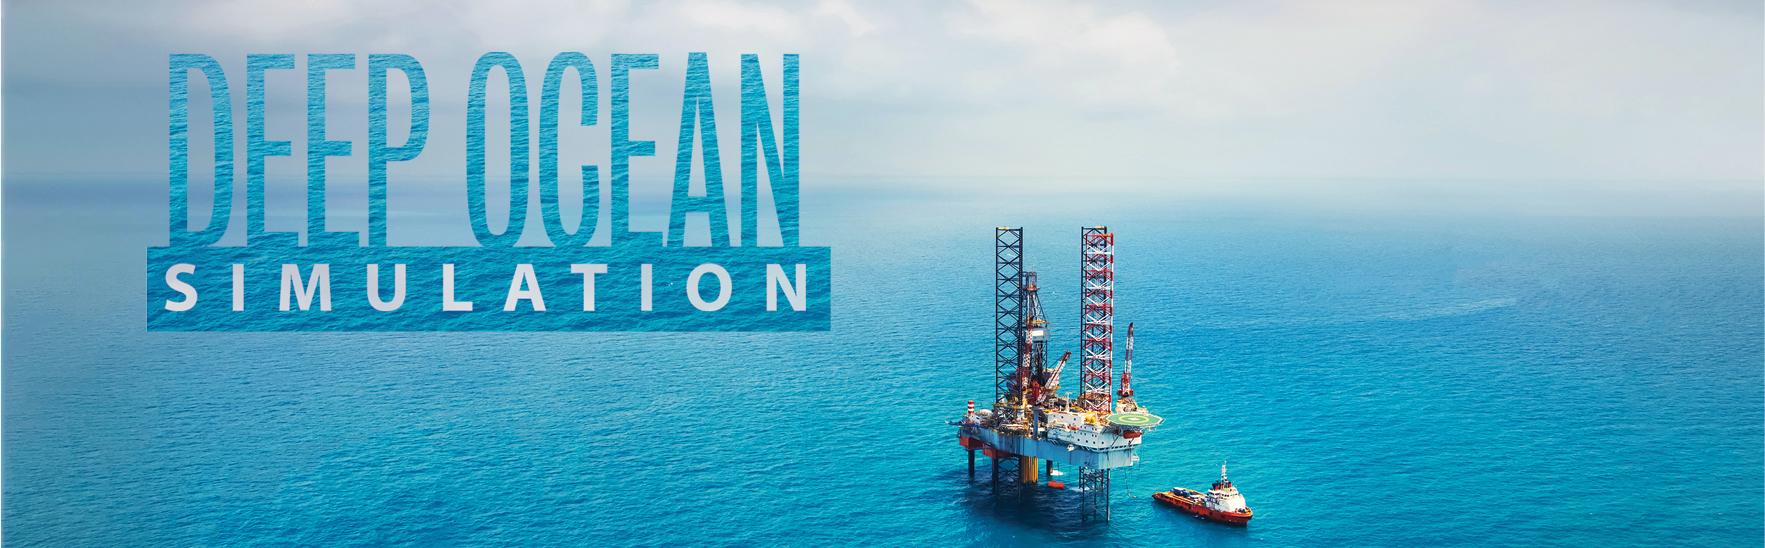 Deep Ocean Simulation infographic